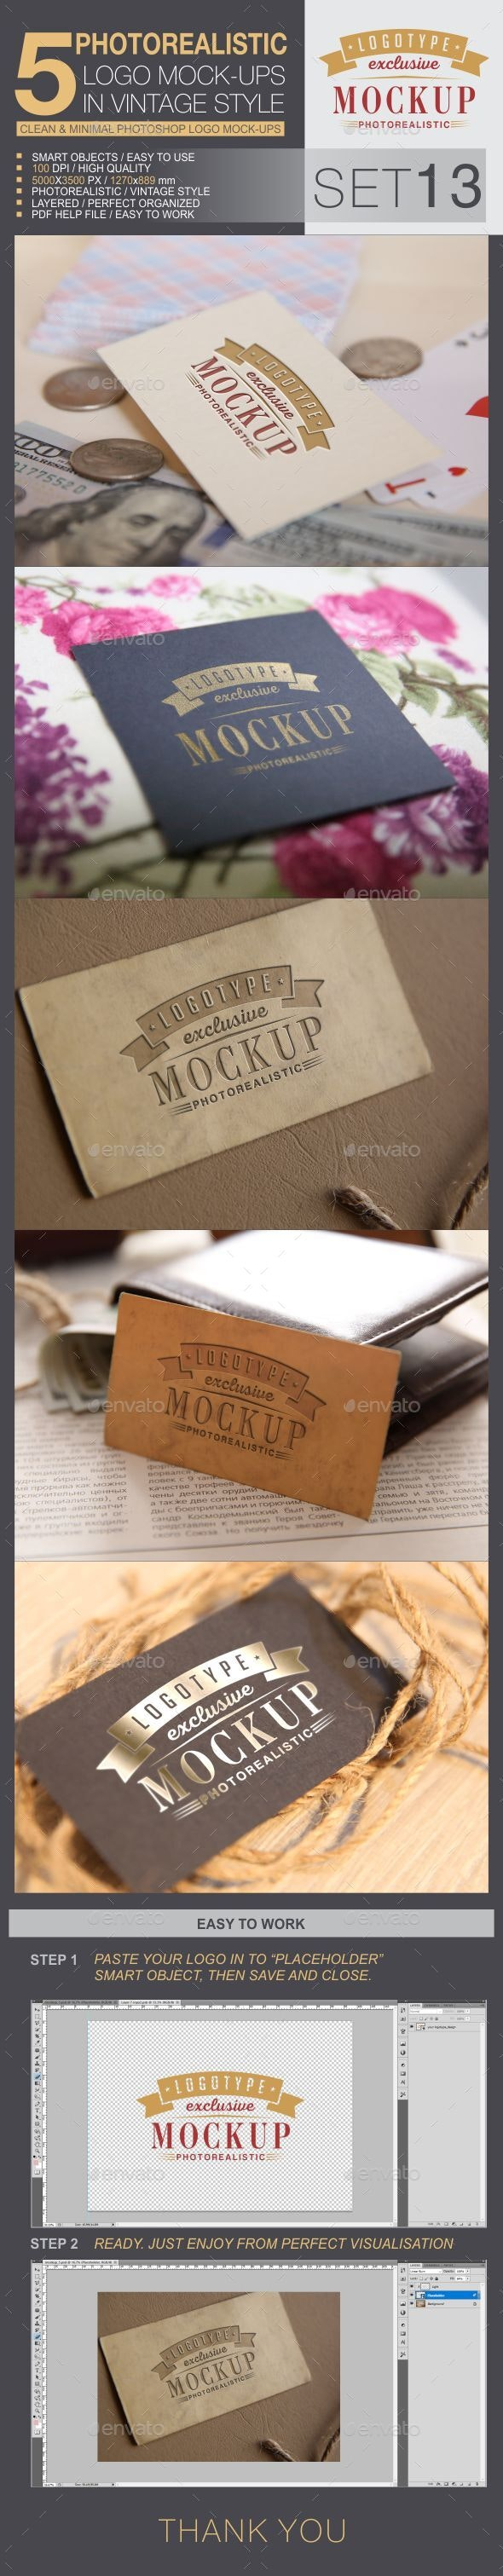 5 Logo Mock-Ups In Vintage Style - Set 13 - Logo Product Mock-Ups